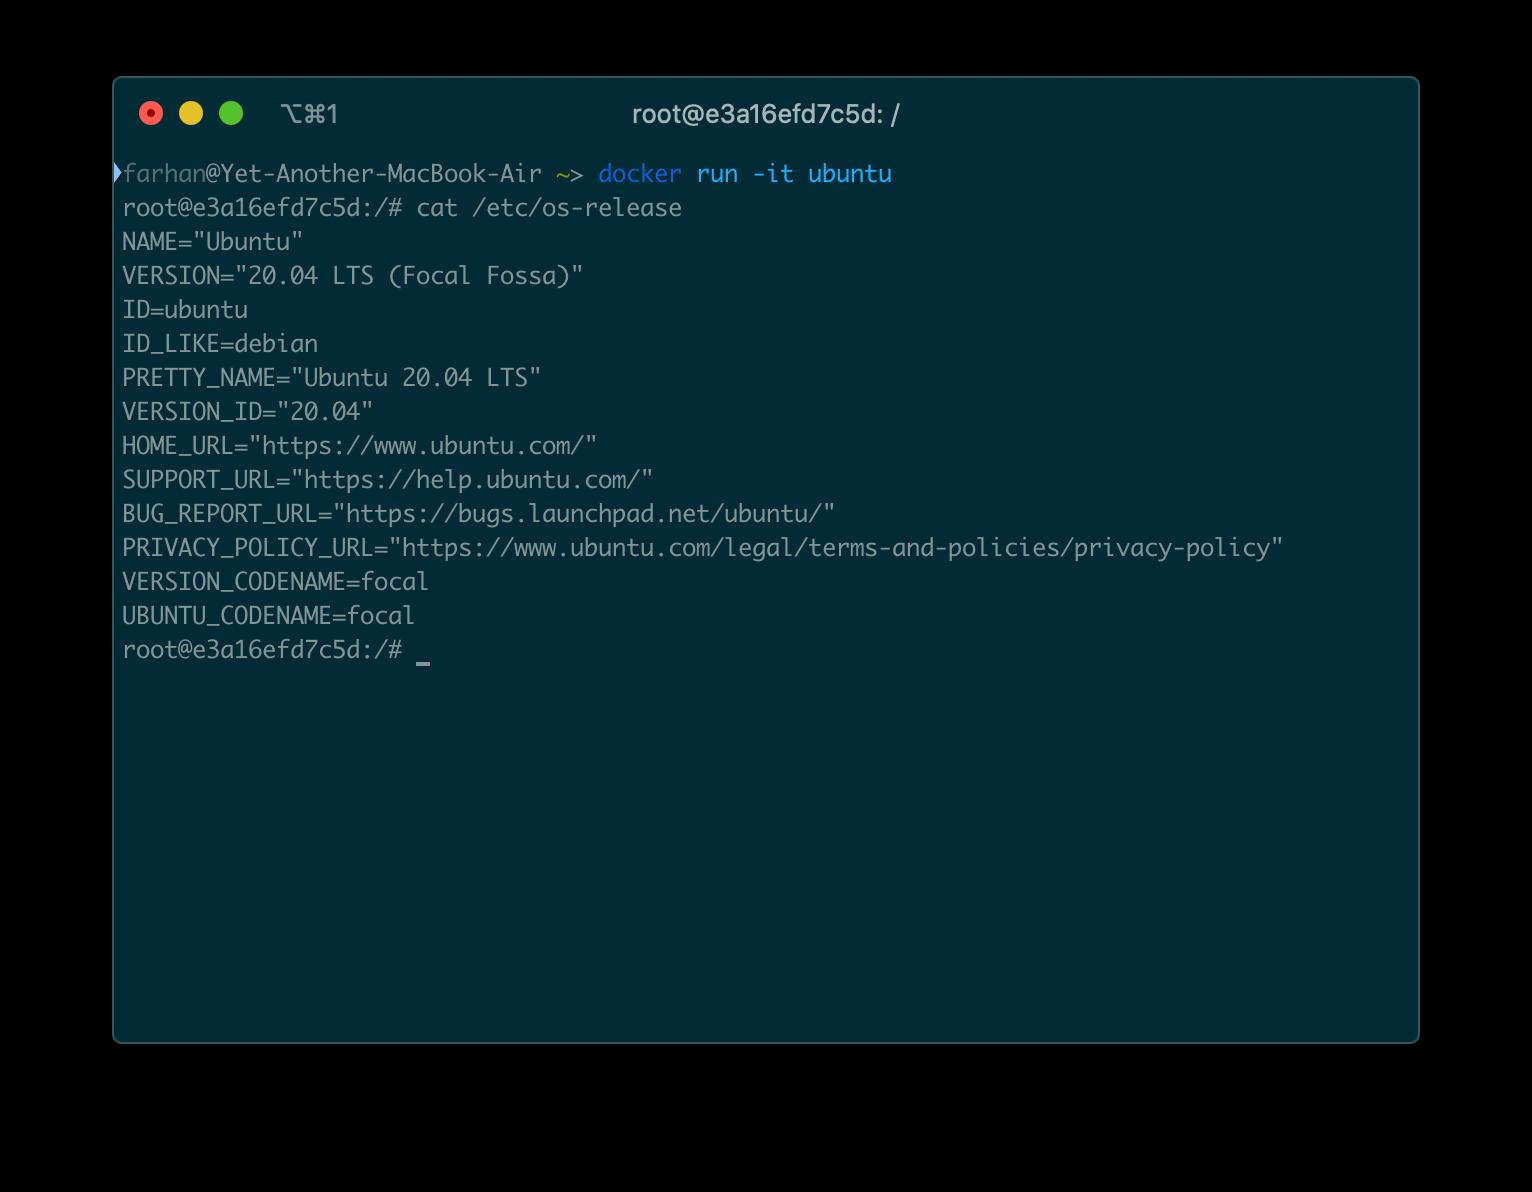 docker run -it ubuntu コマンドからの出力